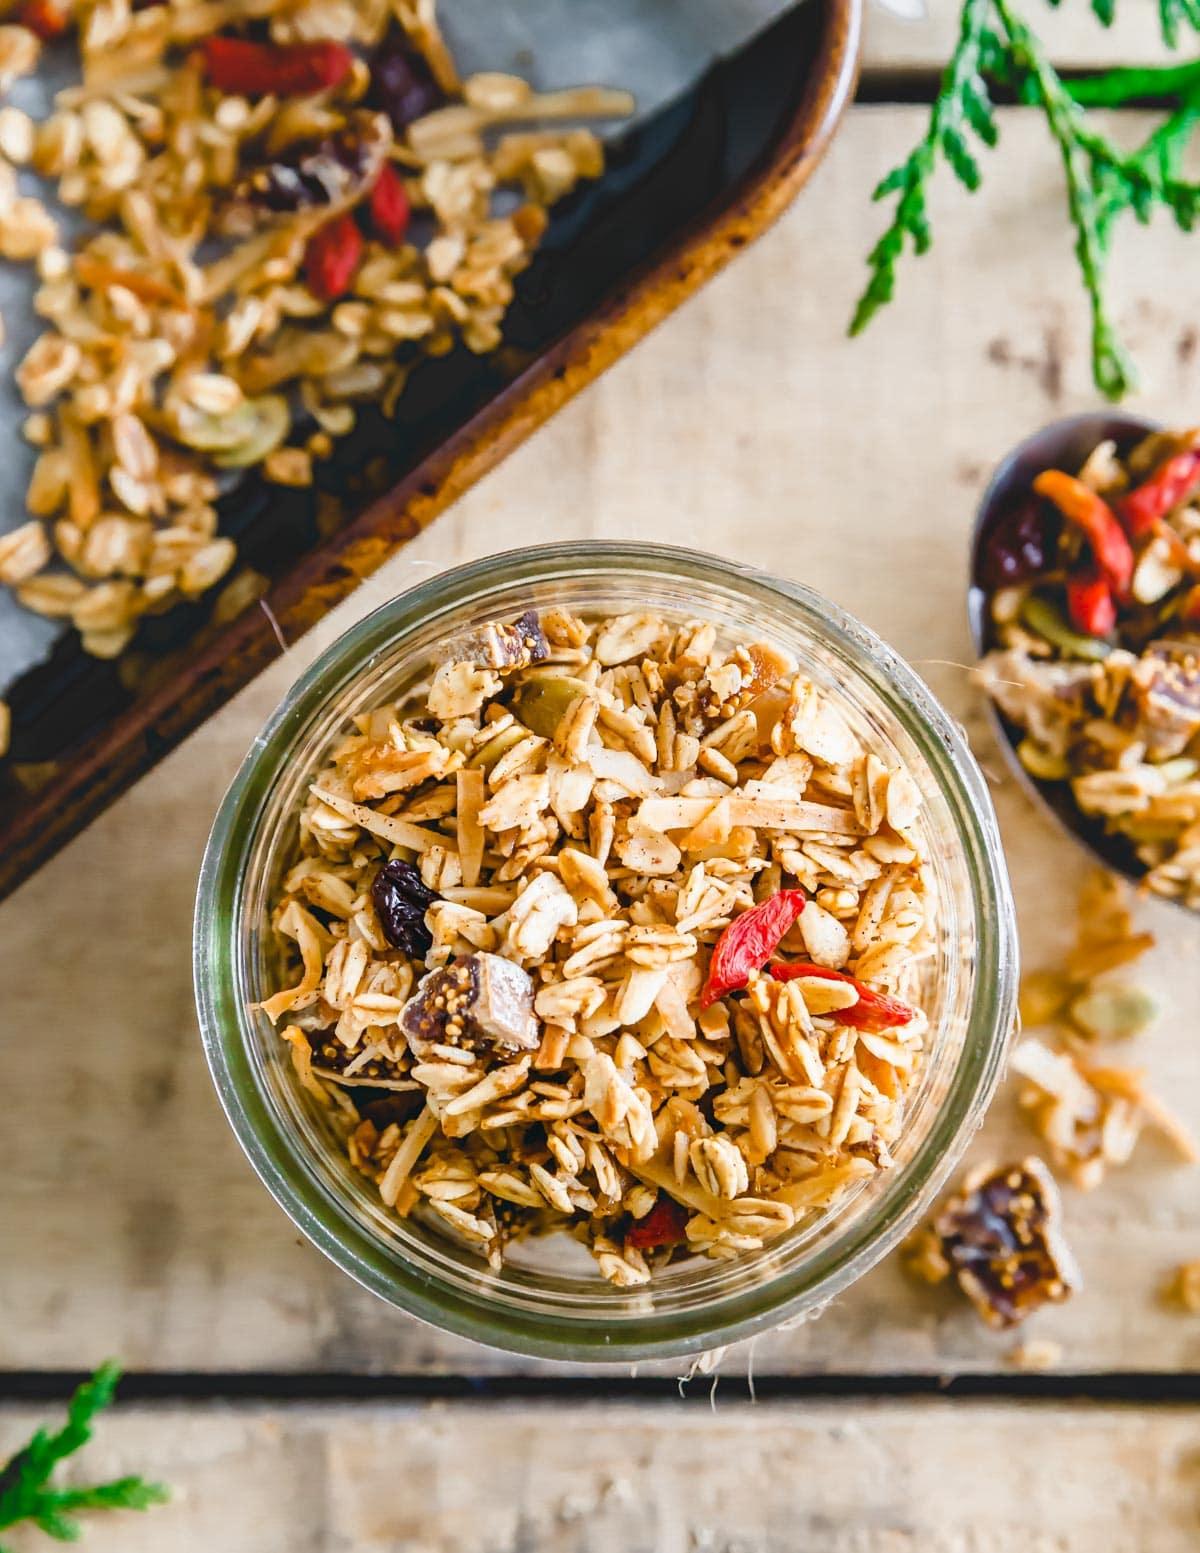 Nut free granola in a glass jar.